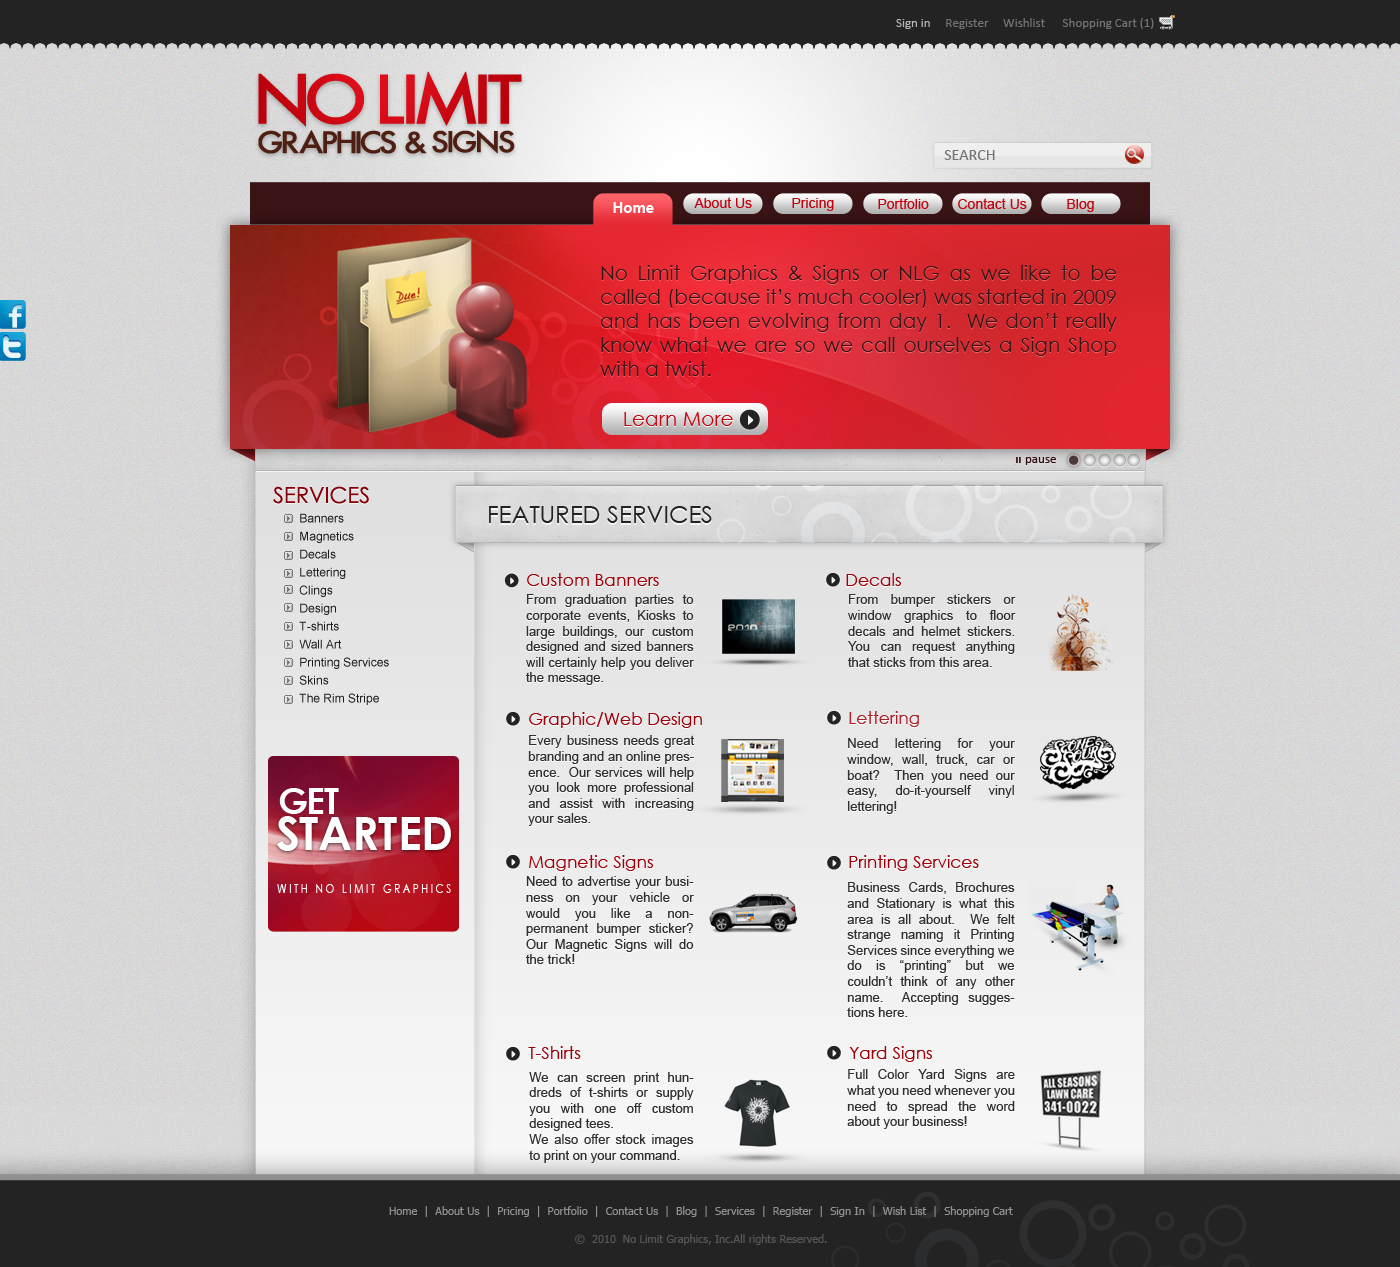 NLG website by karmooz